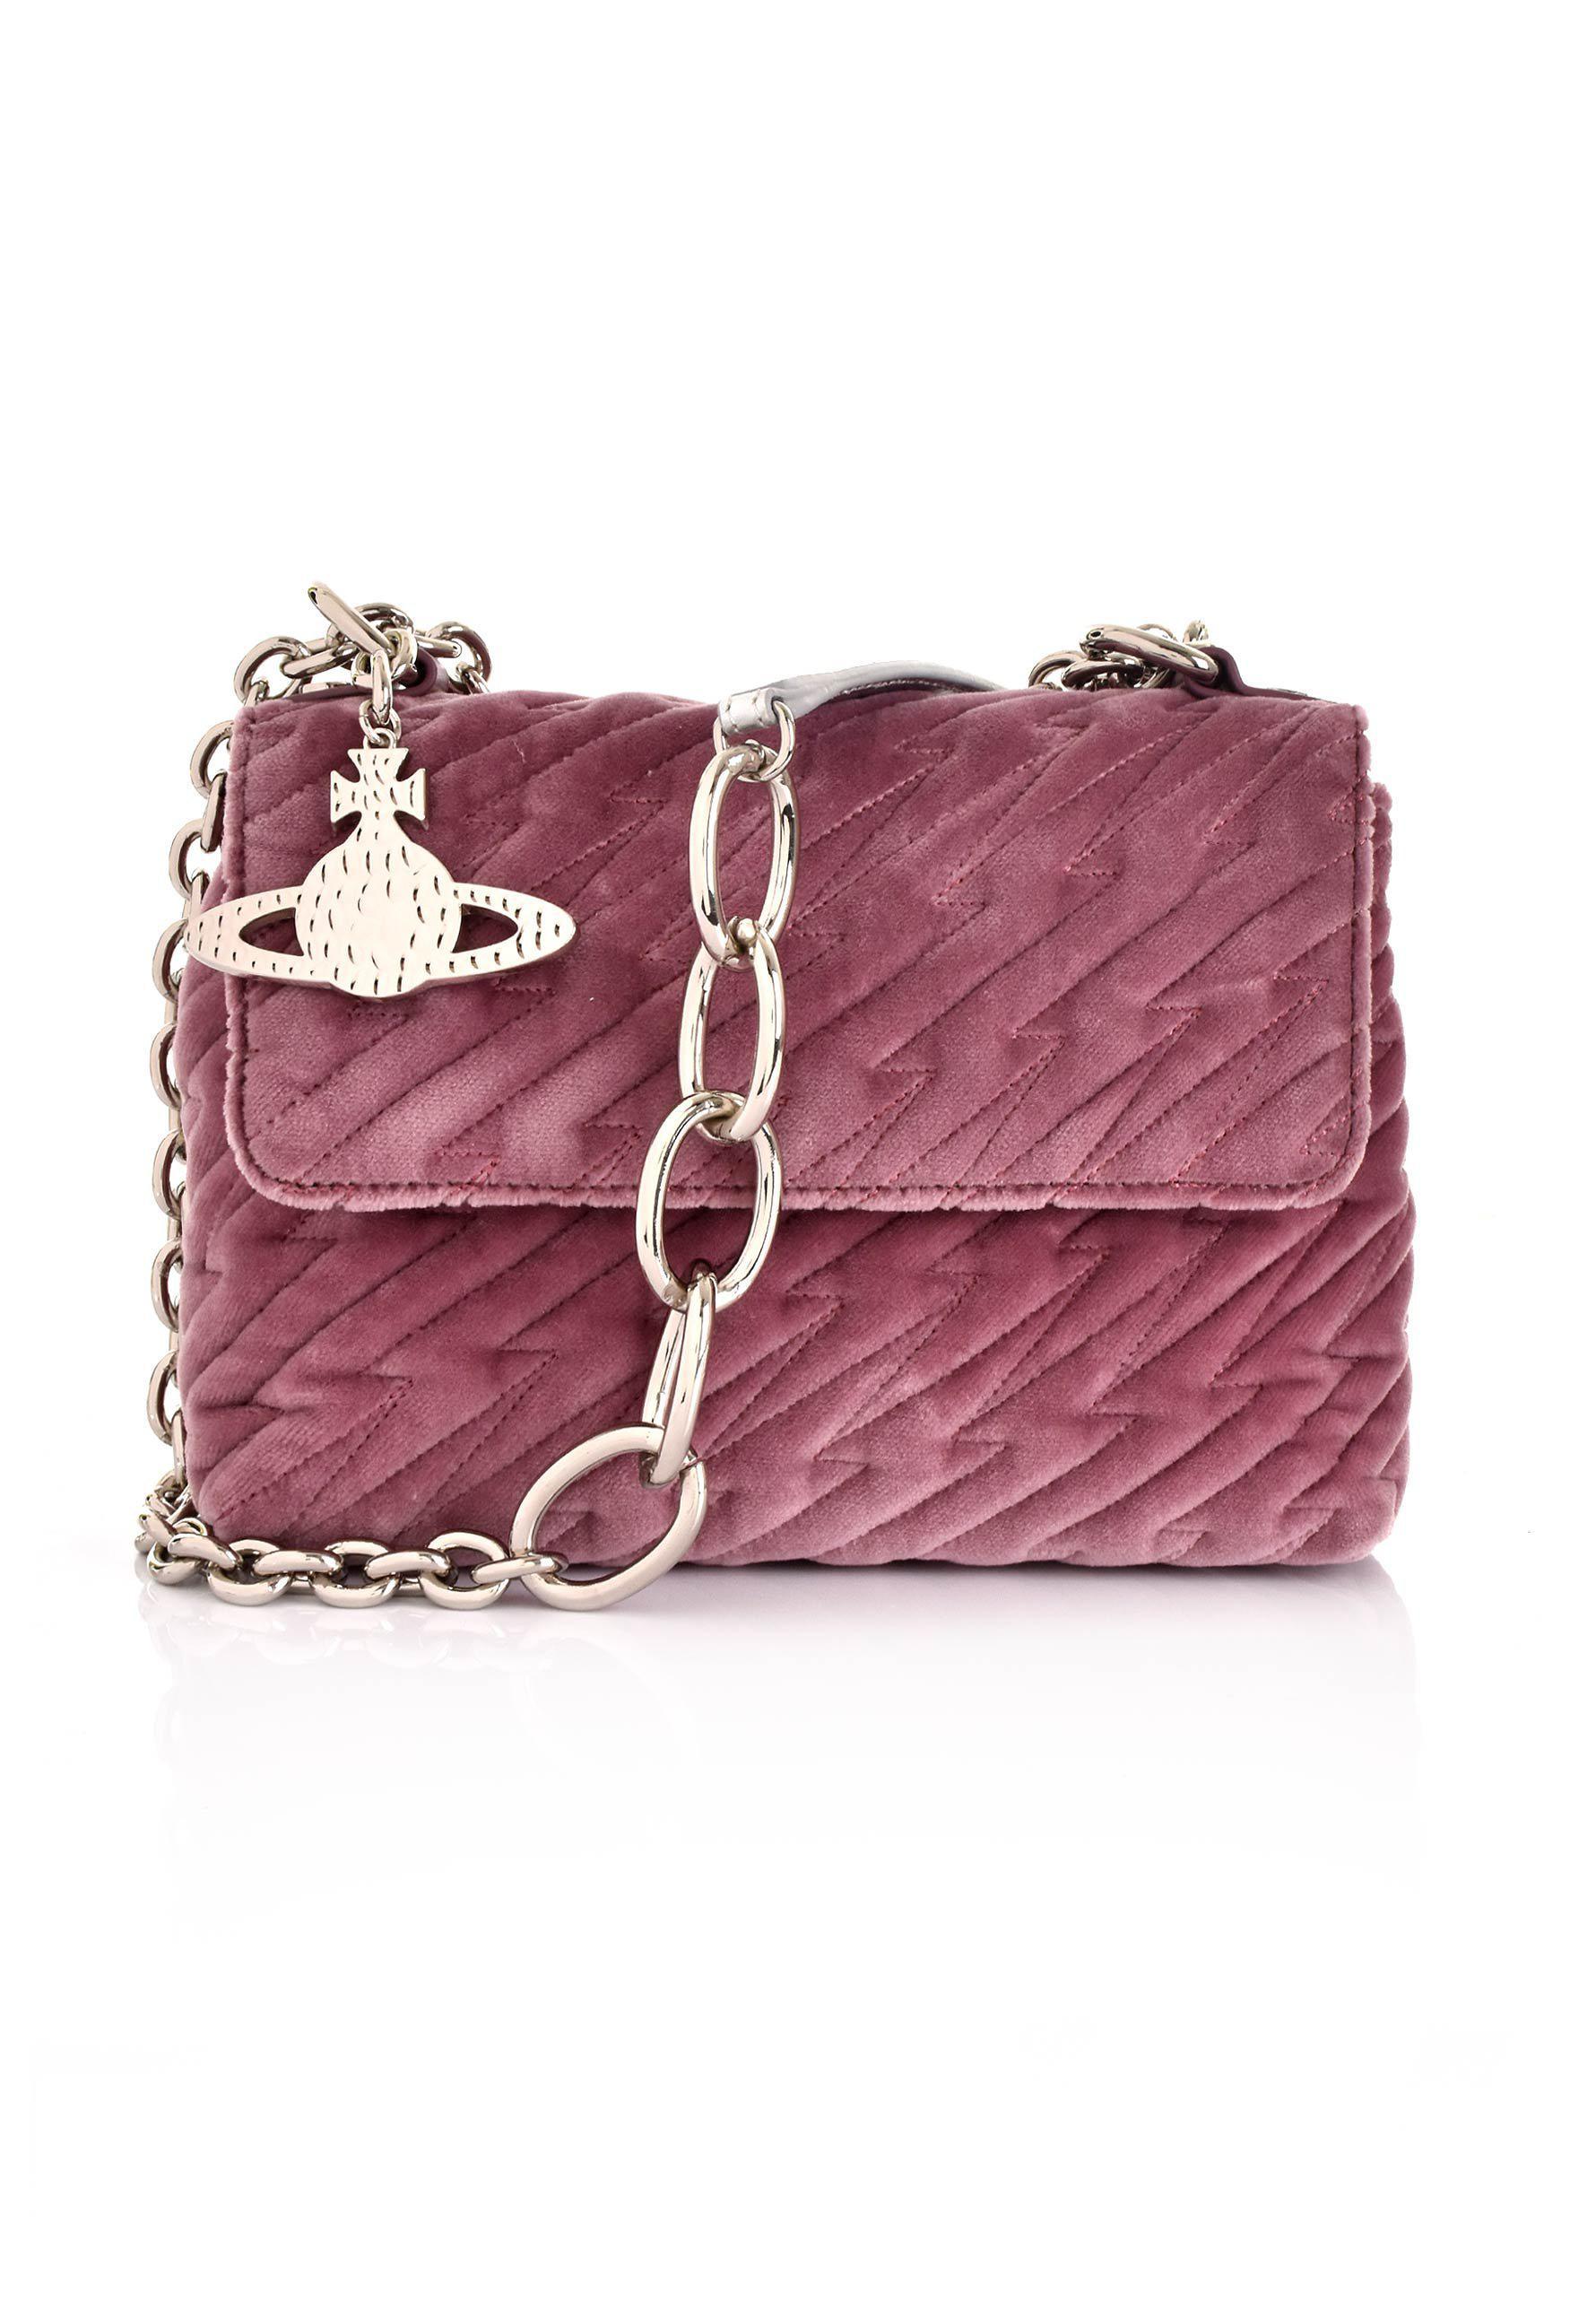 aeb197d60629 Lyst - Vivienne Westwood Coventry Velvet Medium Handbag 42020030 ...